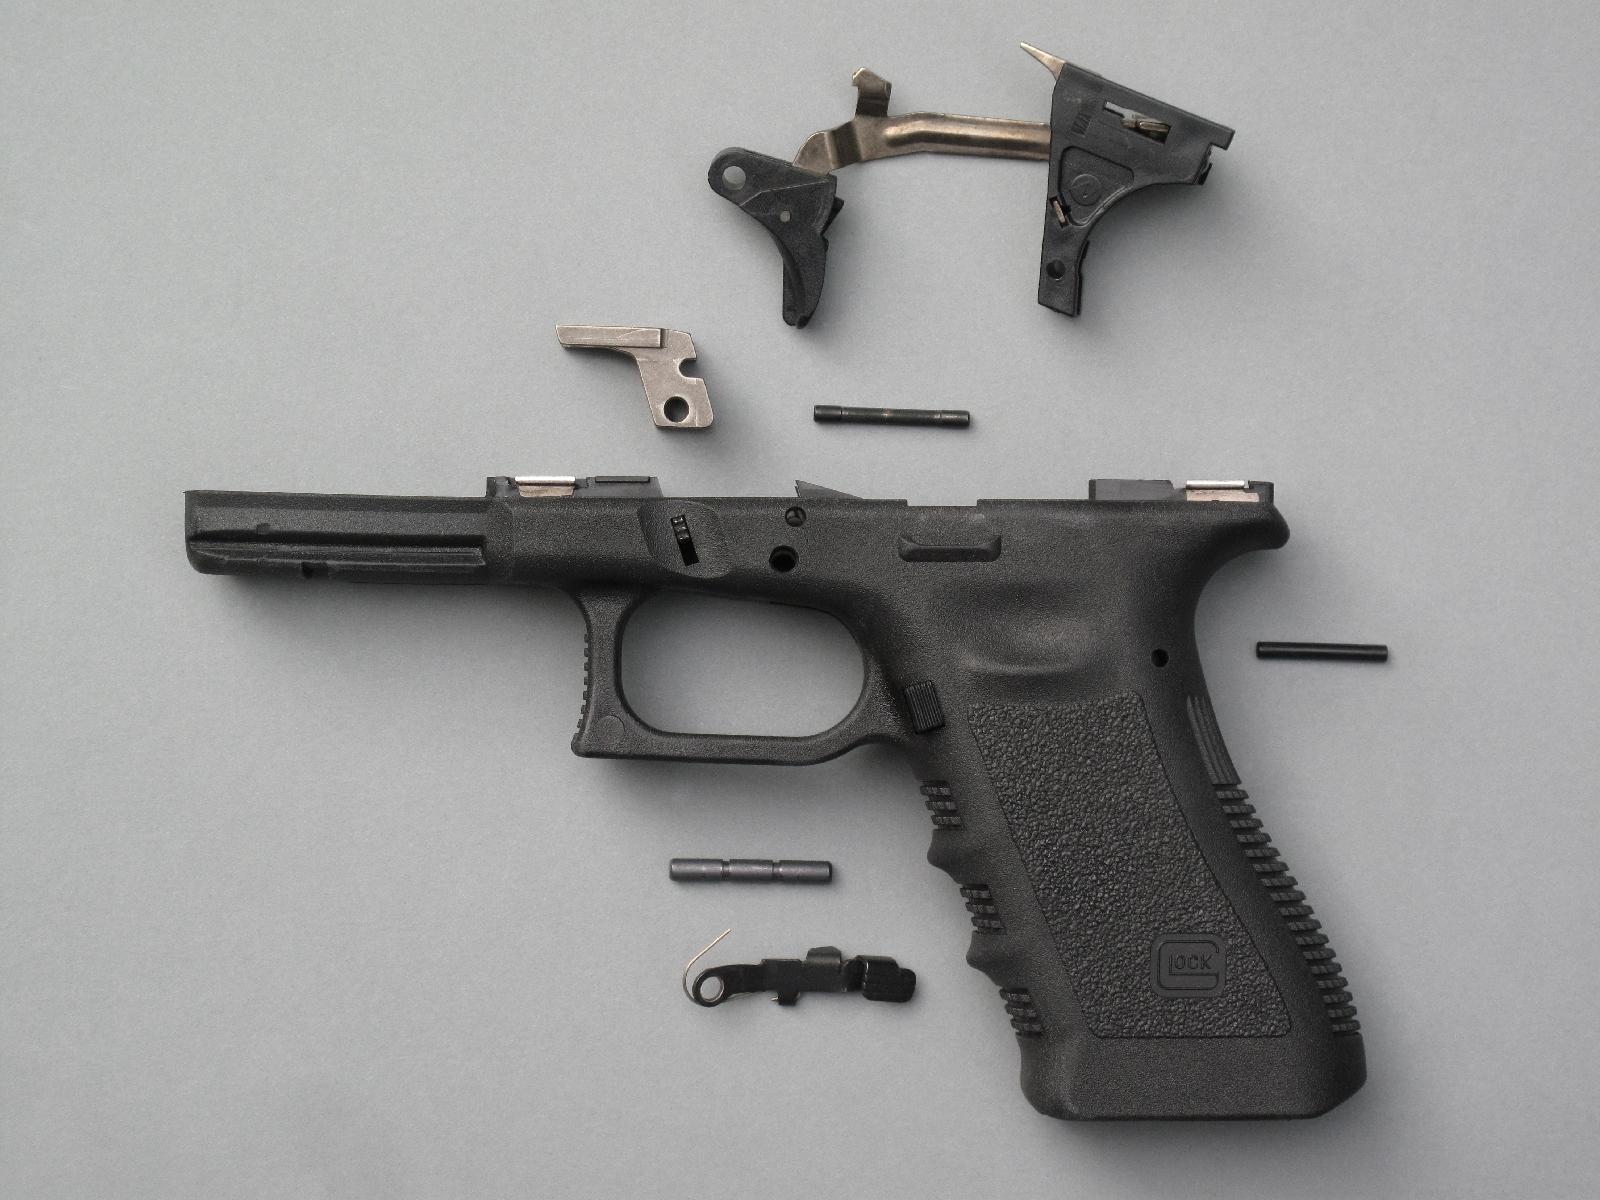 Armes de Poing Ghost Complet Ressort Kit pour Glock Gen 1-5 Pistolets